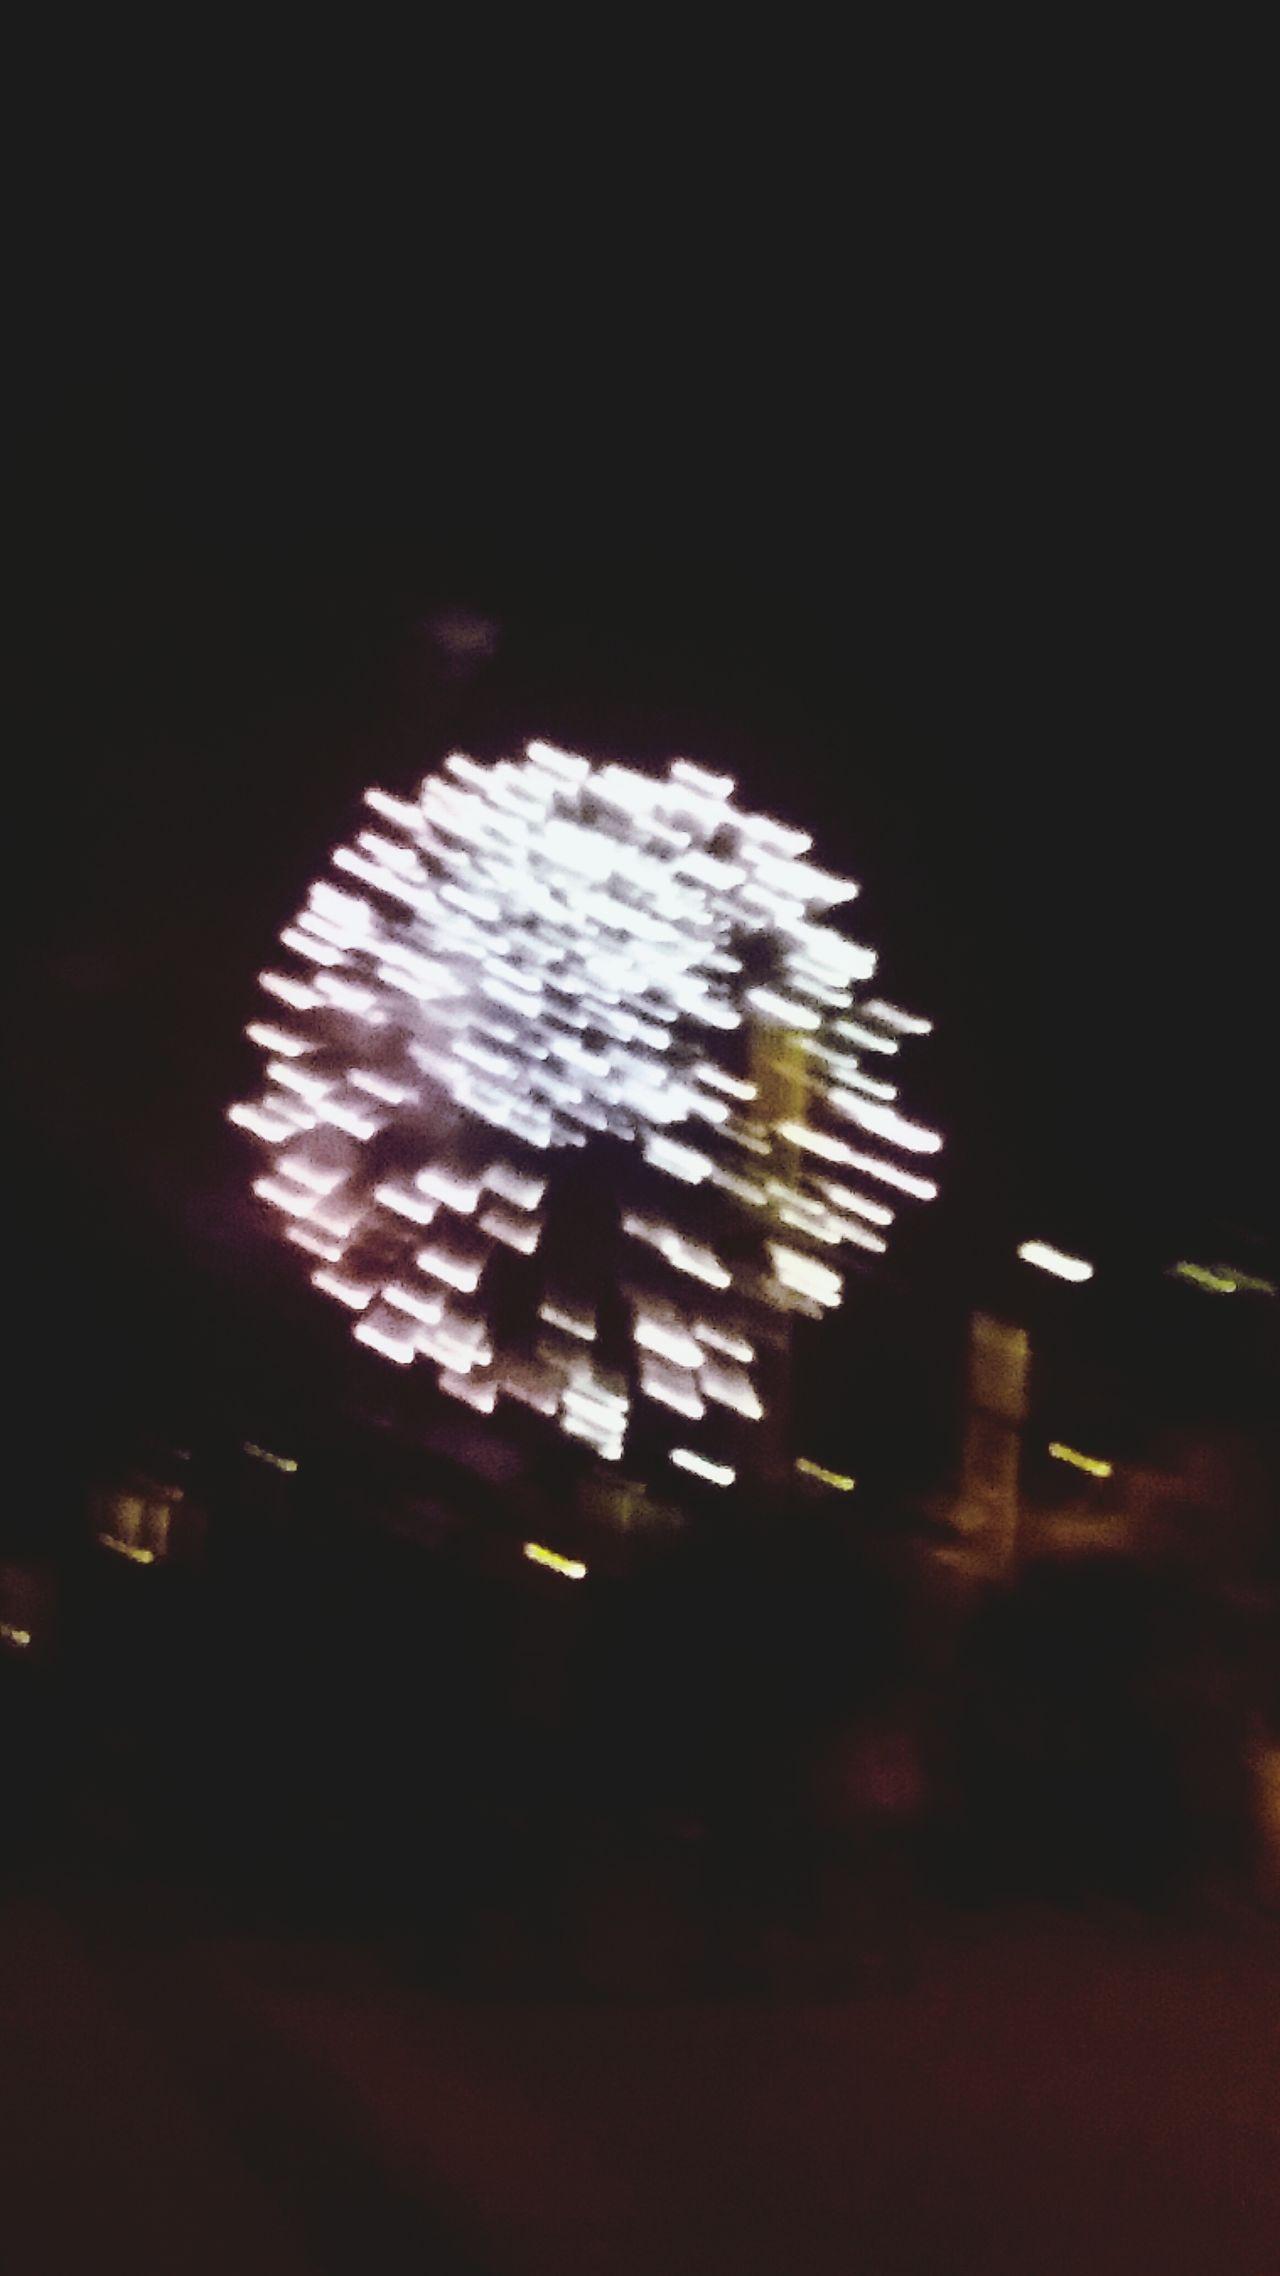 Solias ser lo que necesitaba. Illuminated No People Sky Nature Tranquility Futuristic Outdoors Night